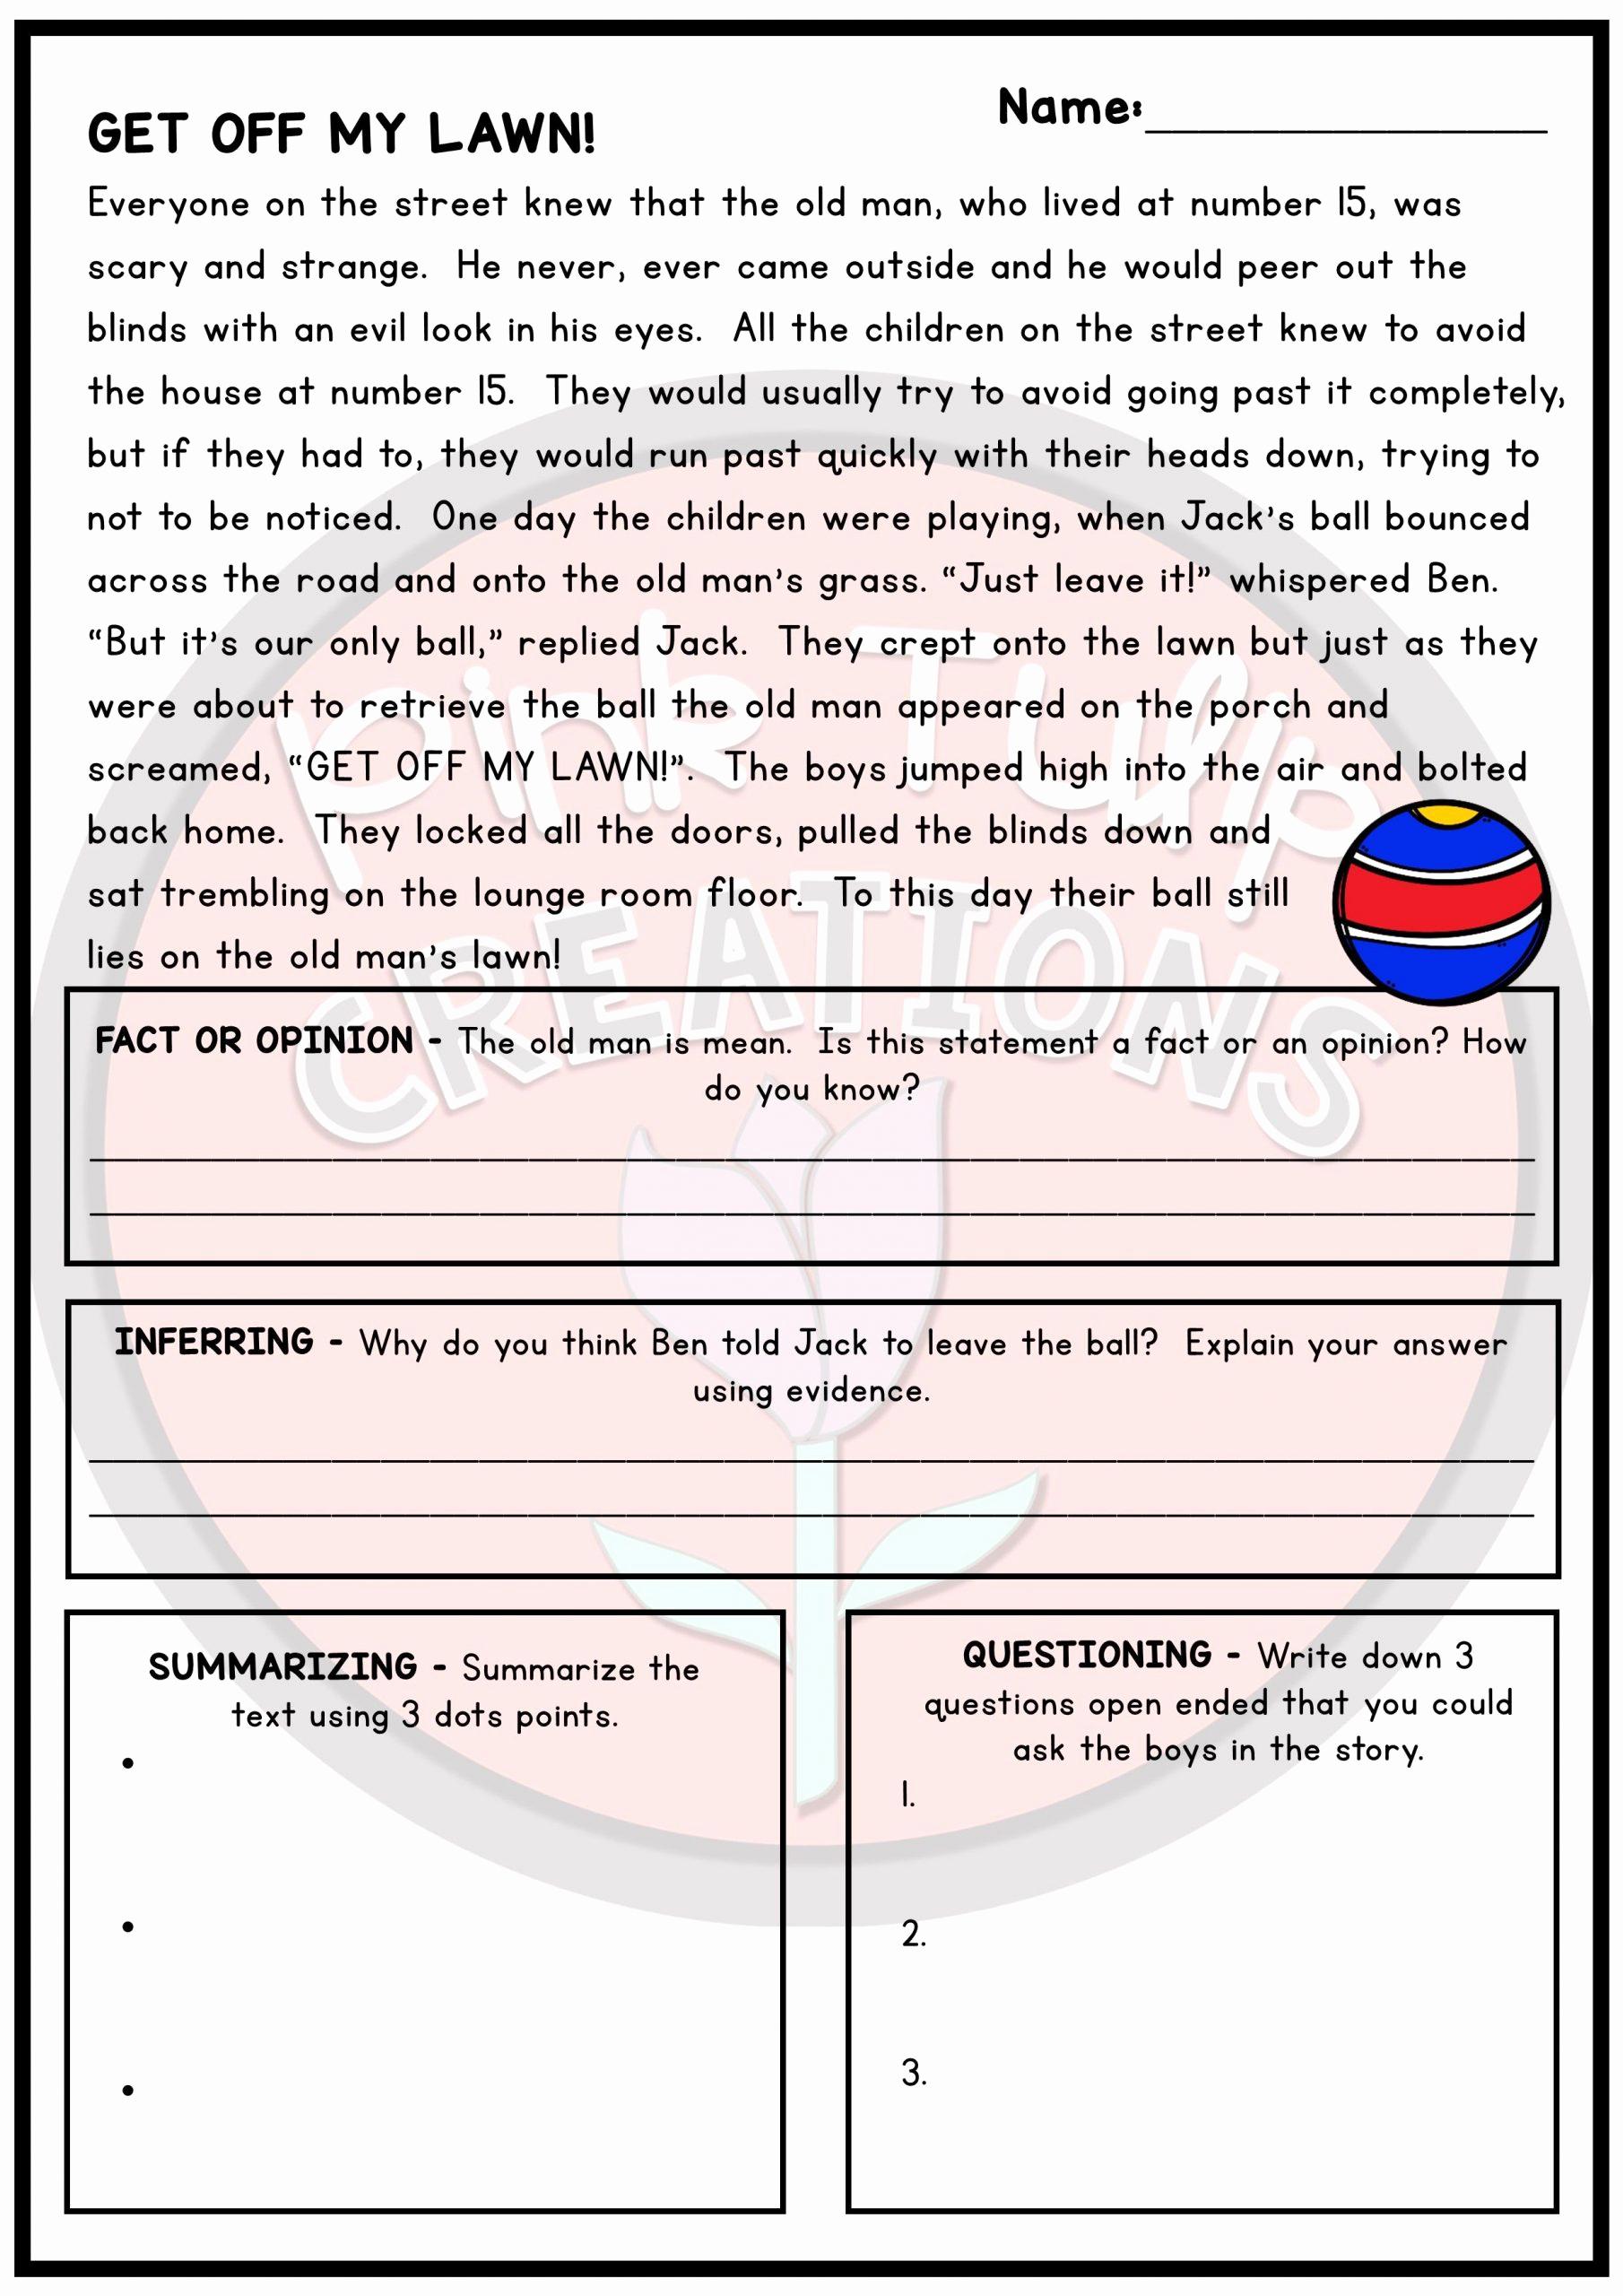 Summarizing Worksheet 3rd Grade Best Of 20 Summarizing Worksheets 3rd Grade